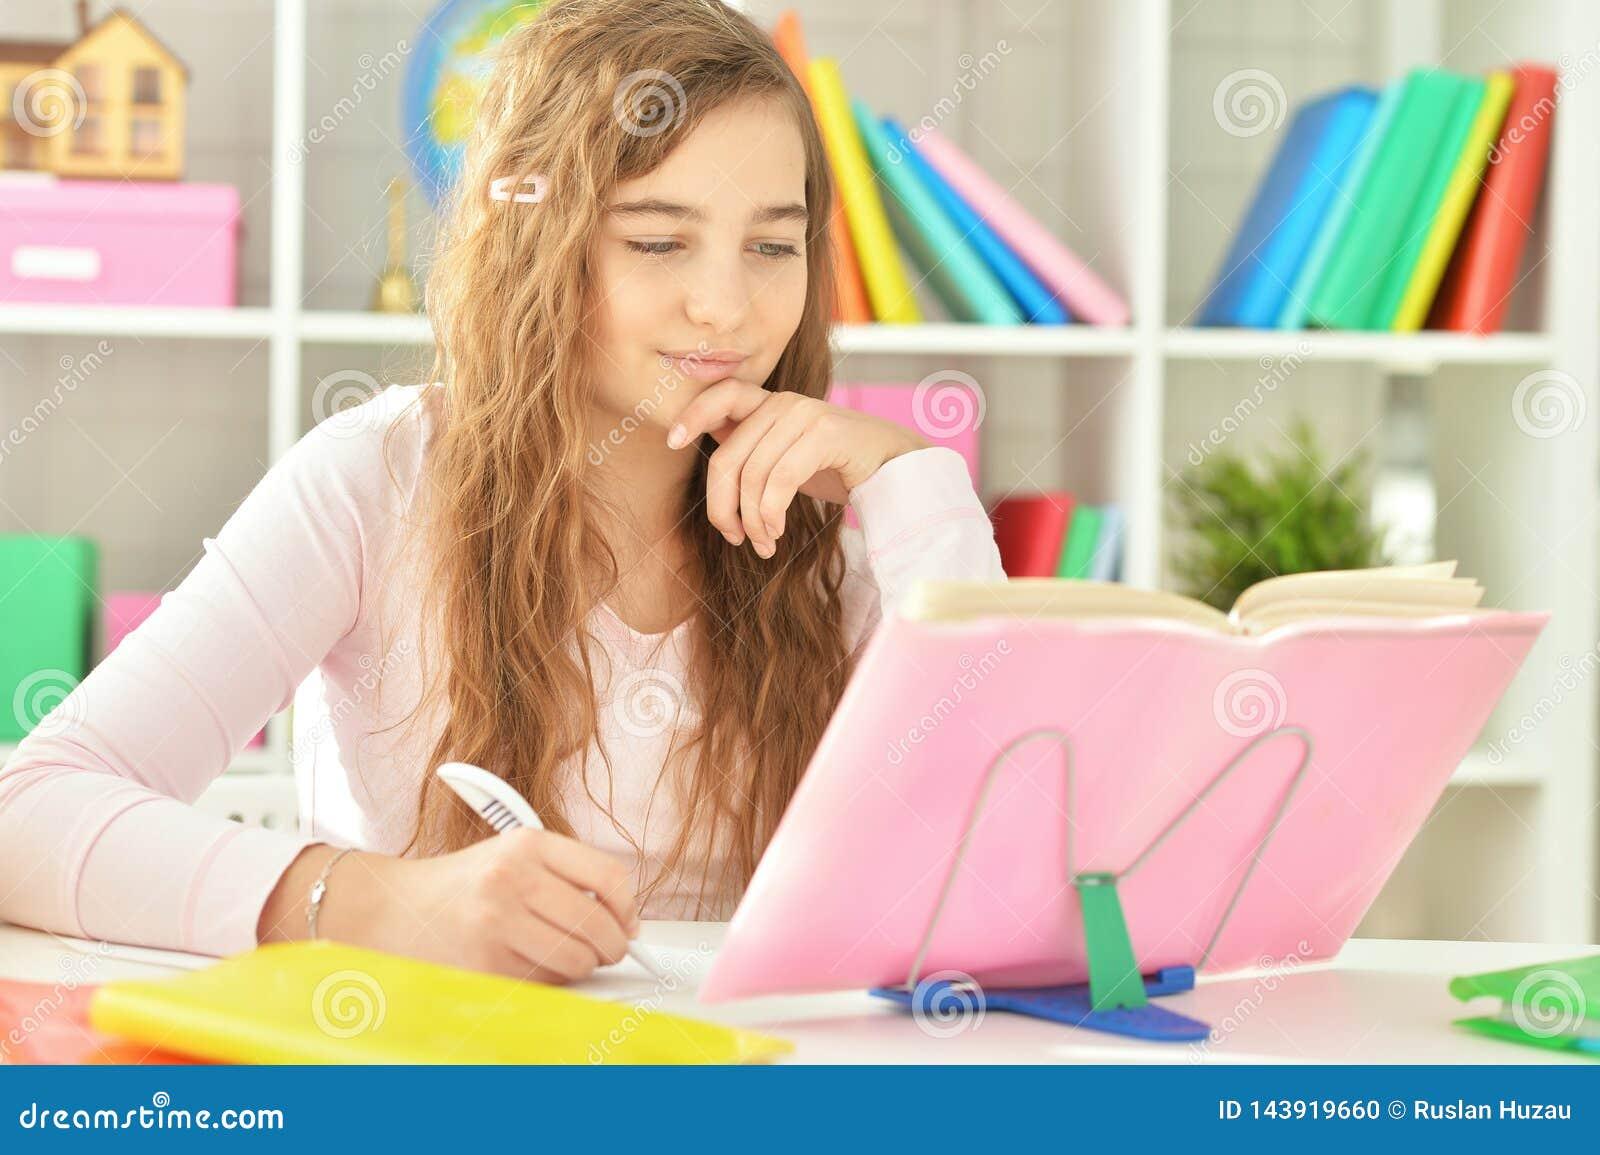 Young Teenager Girl Working On Her Homework Stock Photo